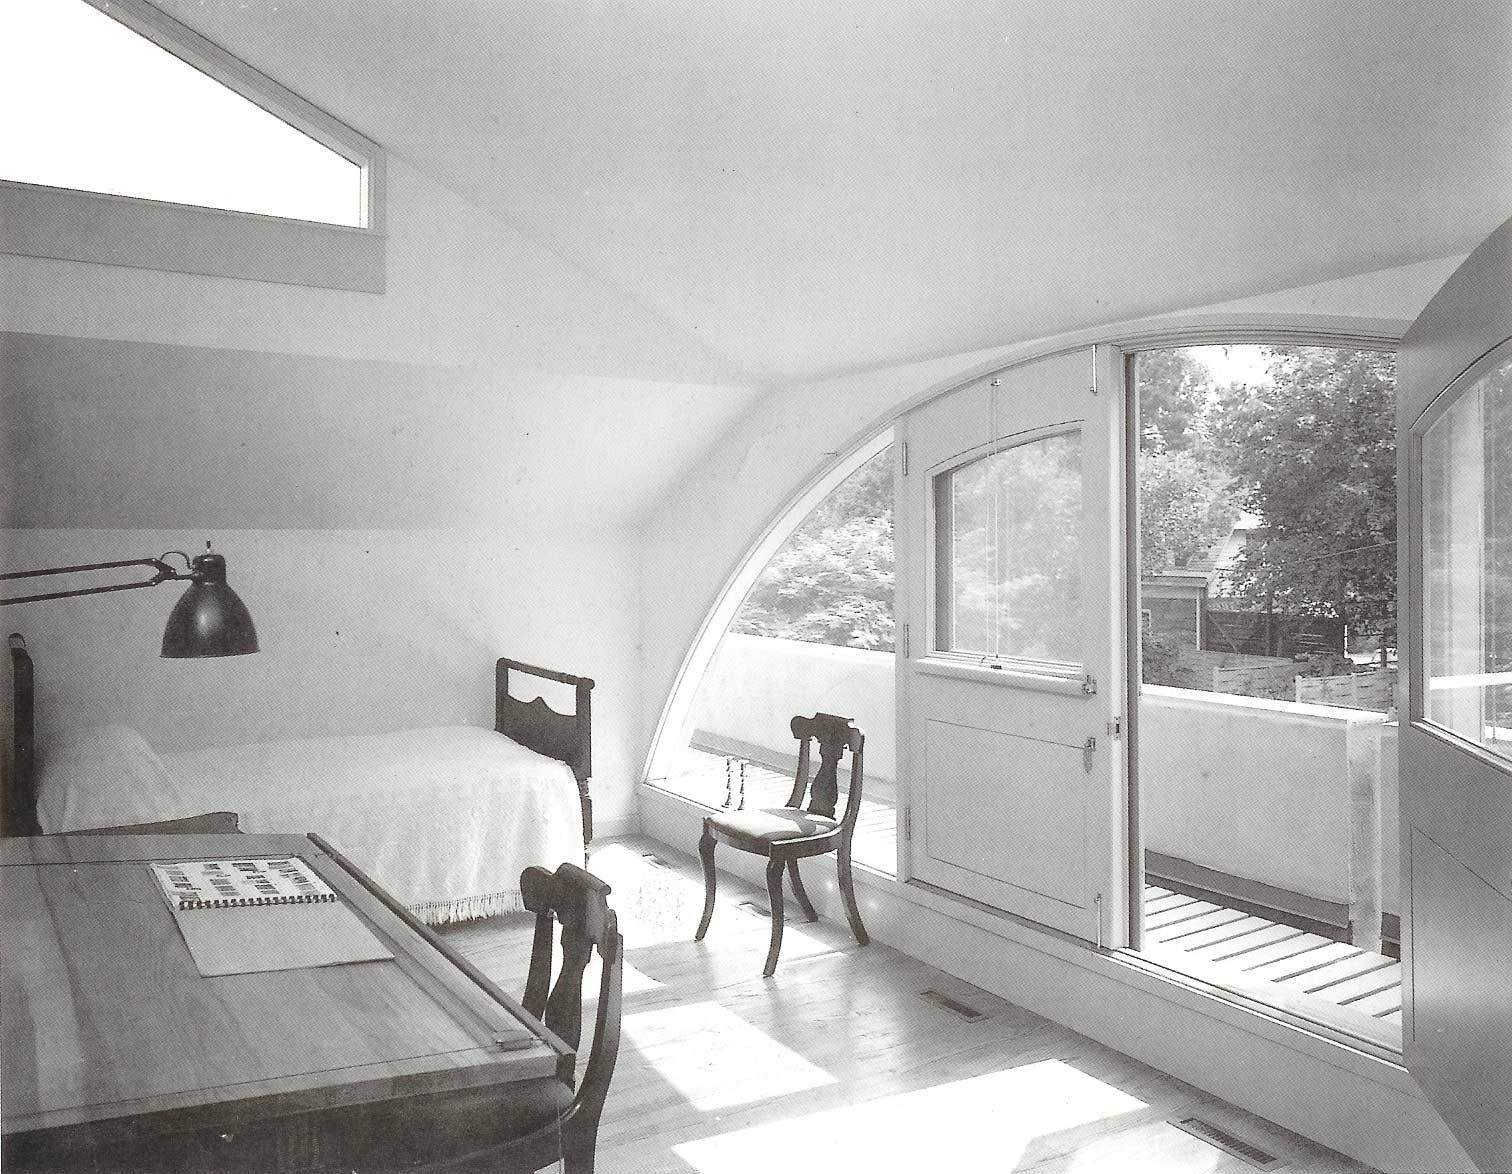 Wilson Le Arch1201 Vanna Venturi House 1962 Mother S